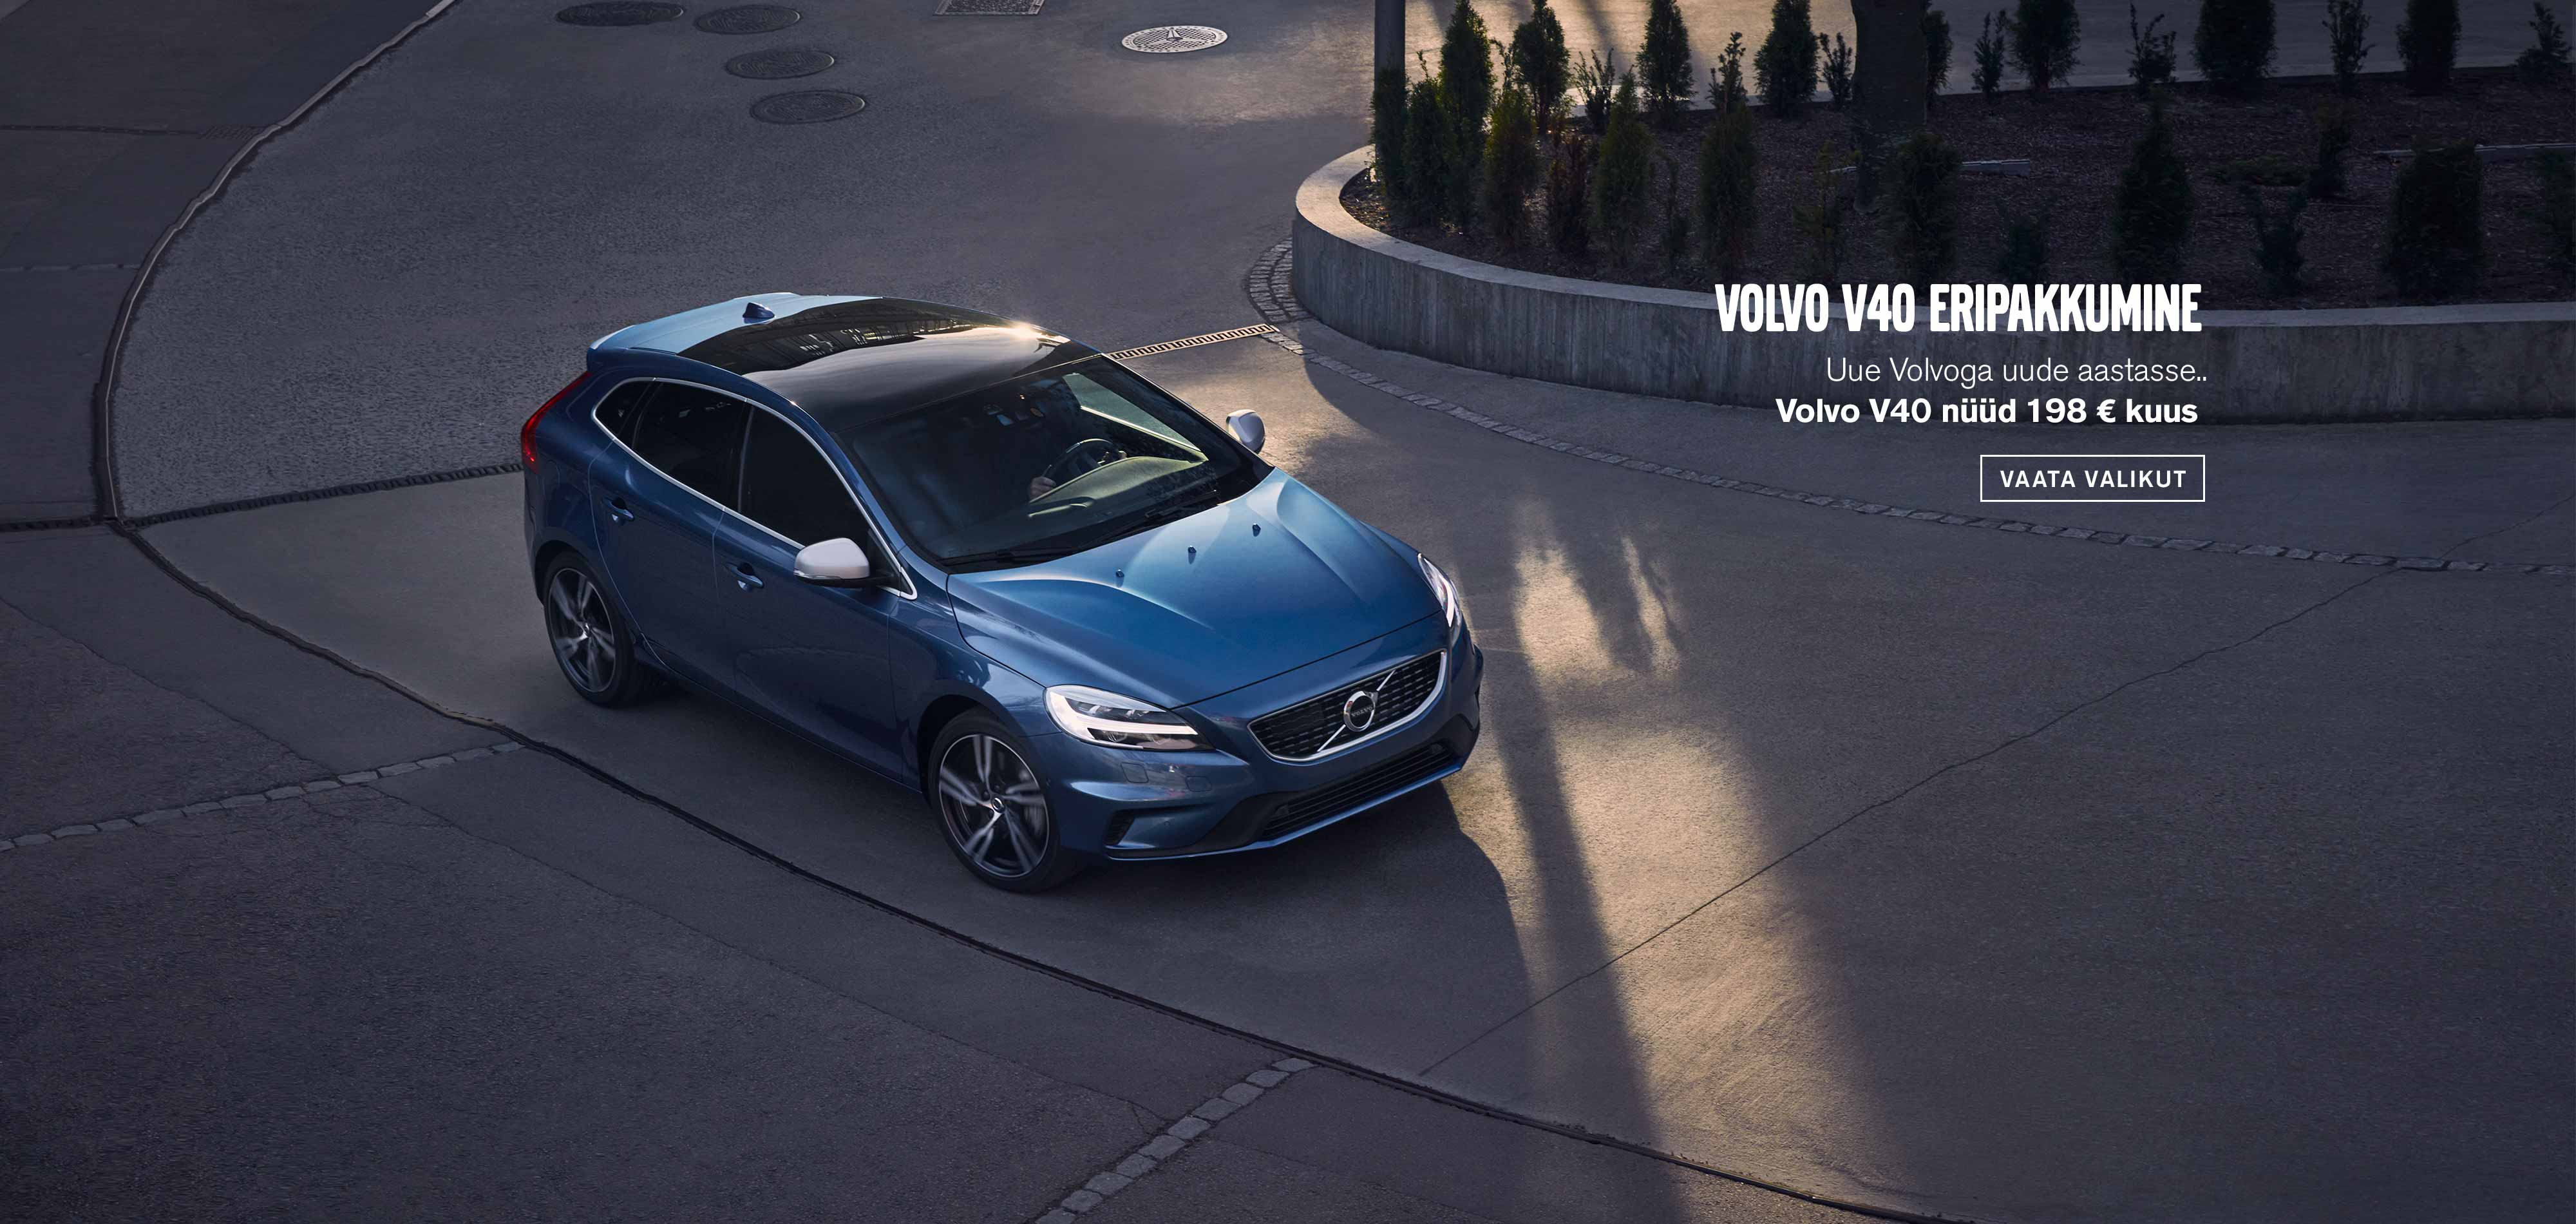 Volvo V40 eripakkumine